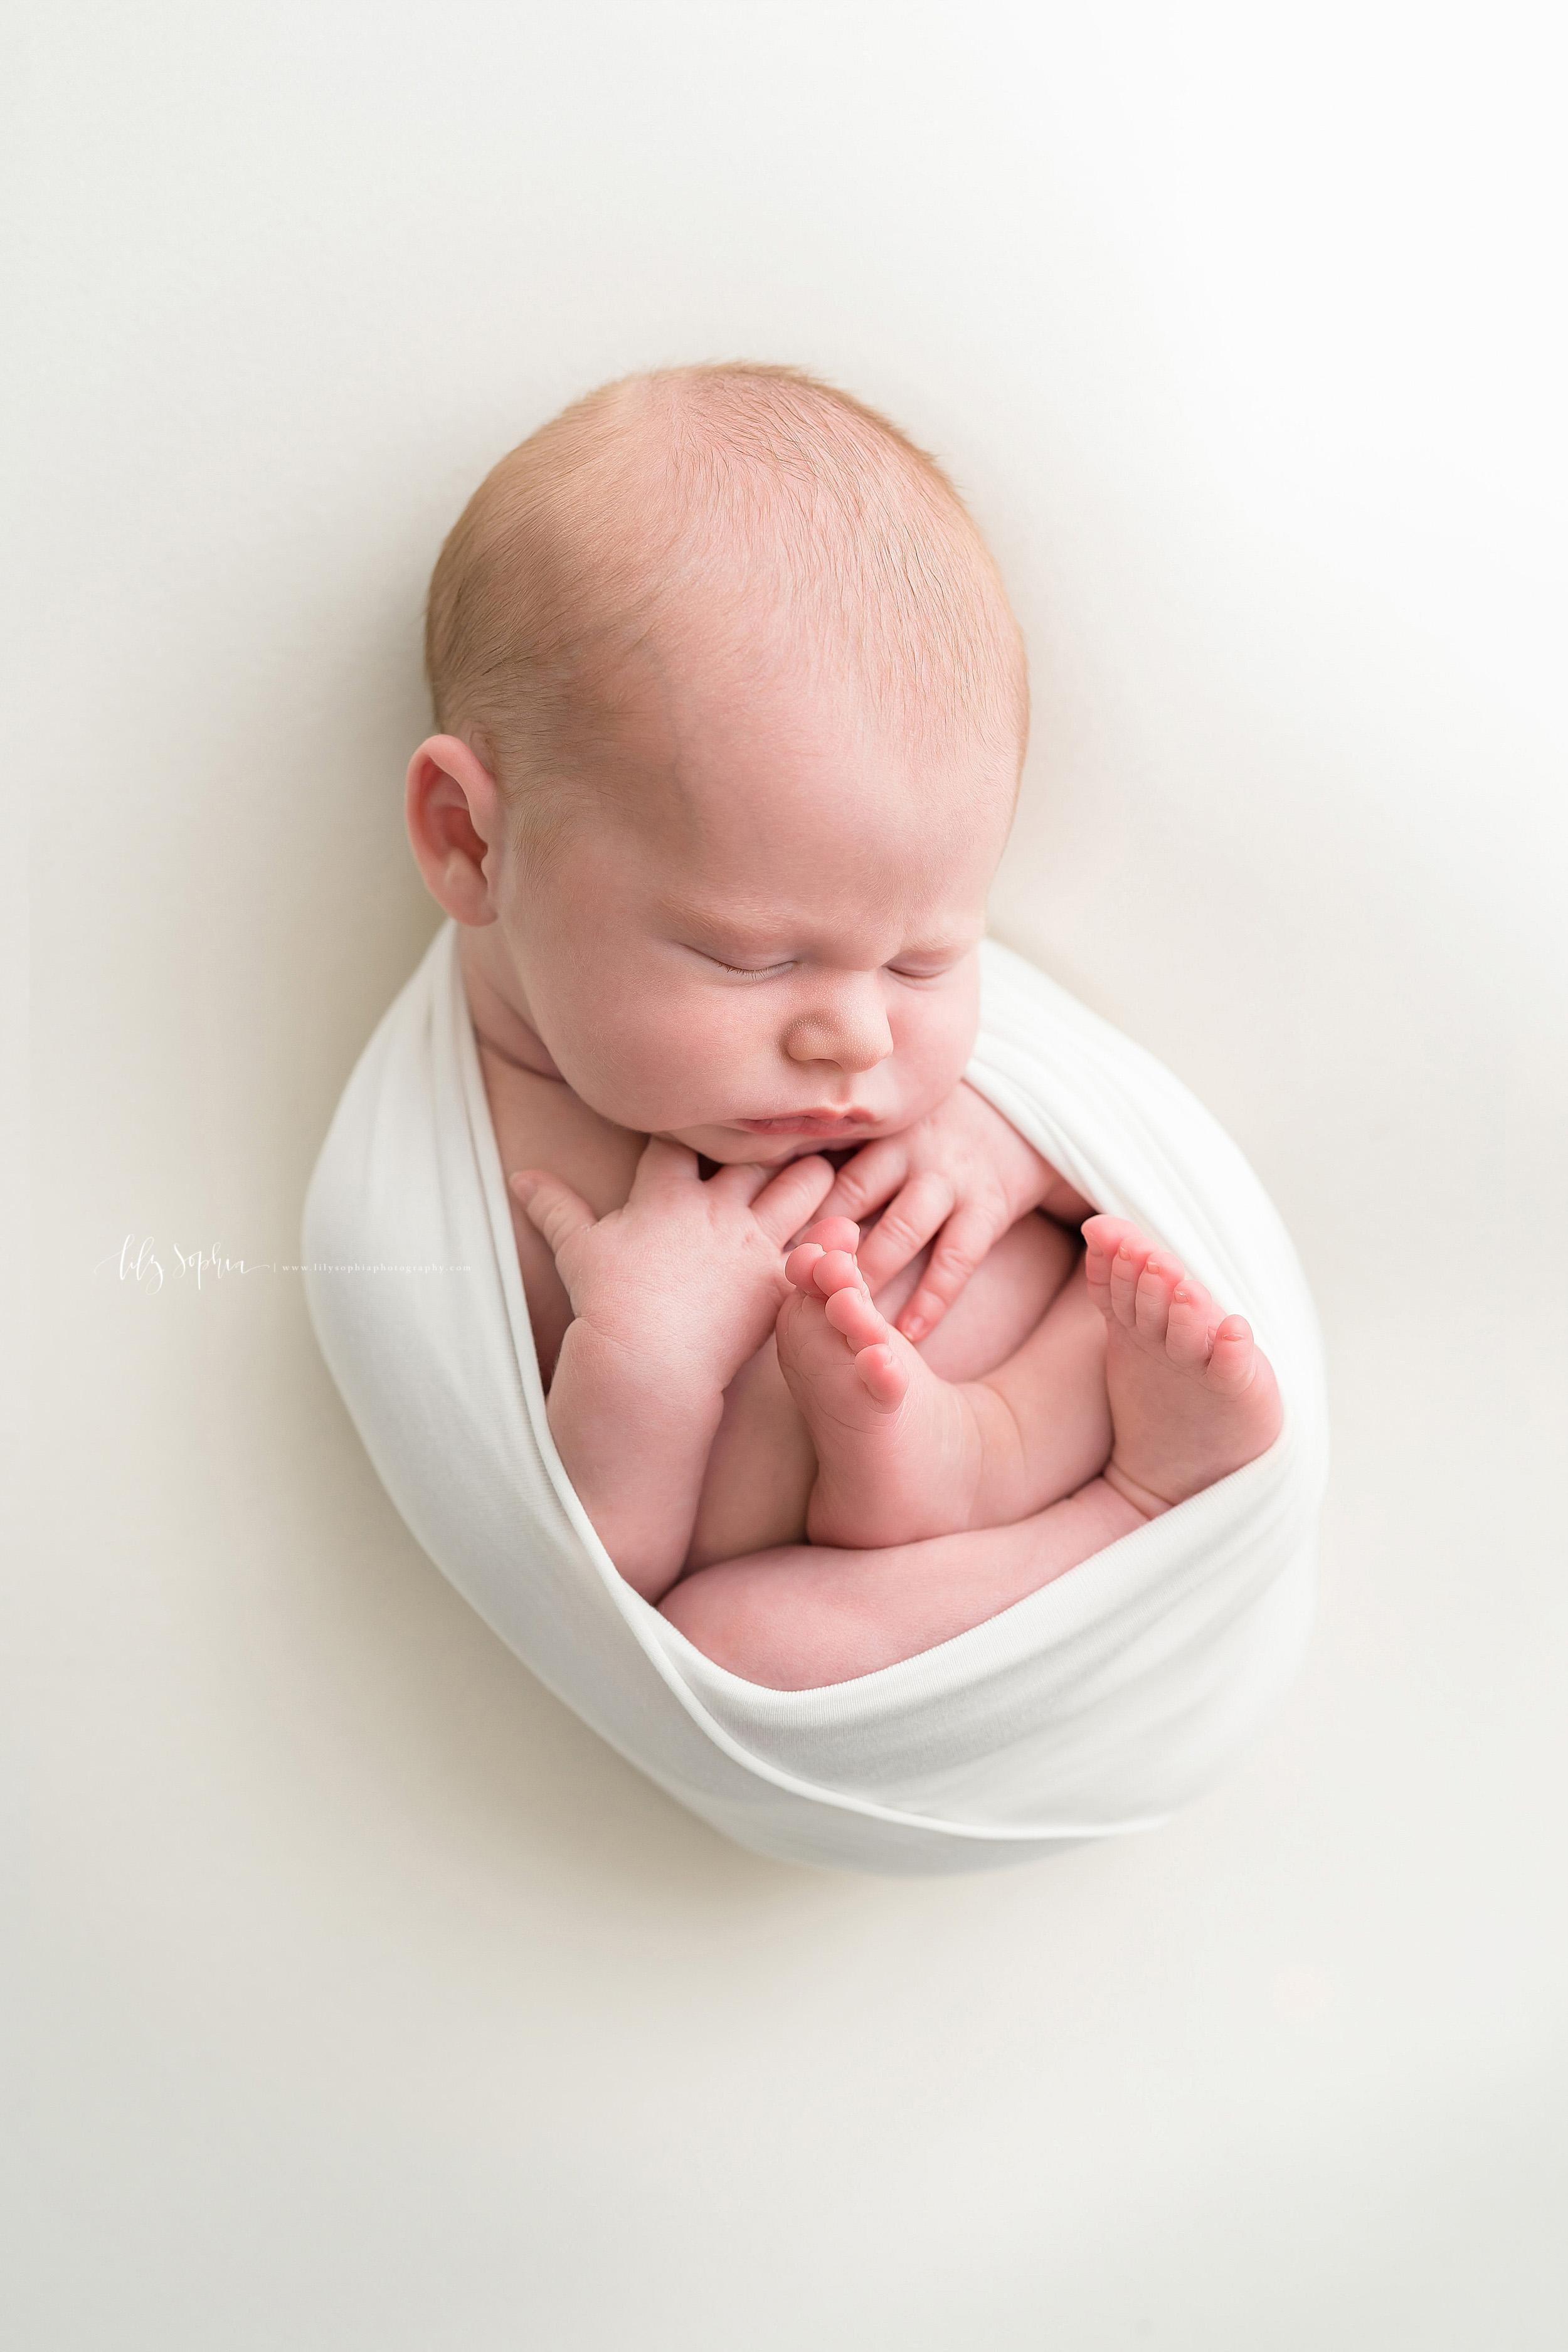 atlanta-decatur-candler-park-sandy-springs-buckhead-virginia-highlands-west-end-decatur-lily-sophia-photography-studio-newborn-baby-boy-family-photos_1736.jpg